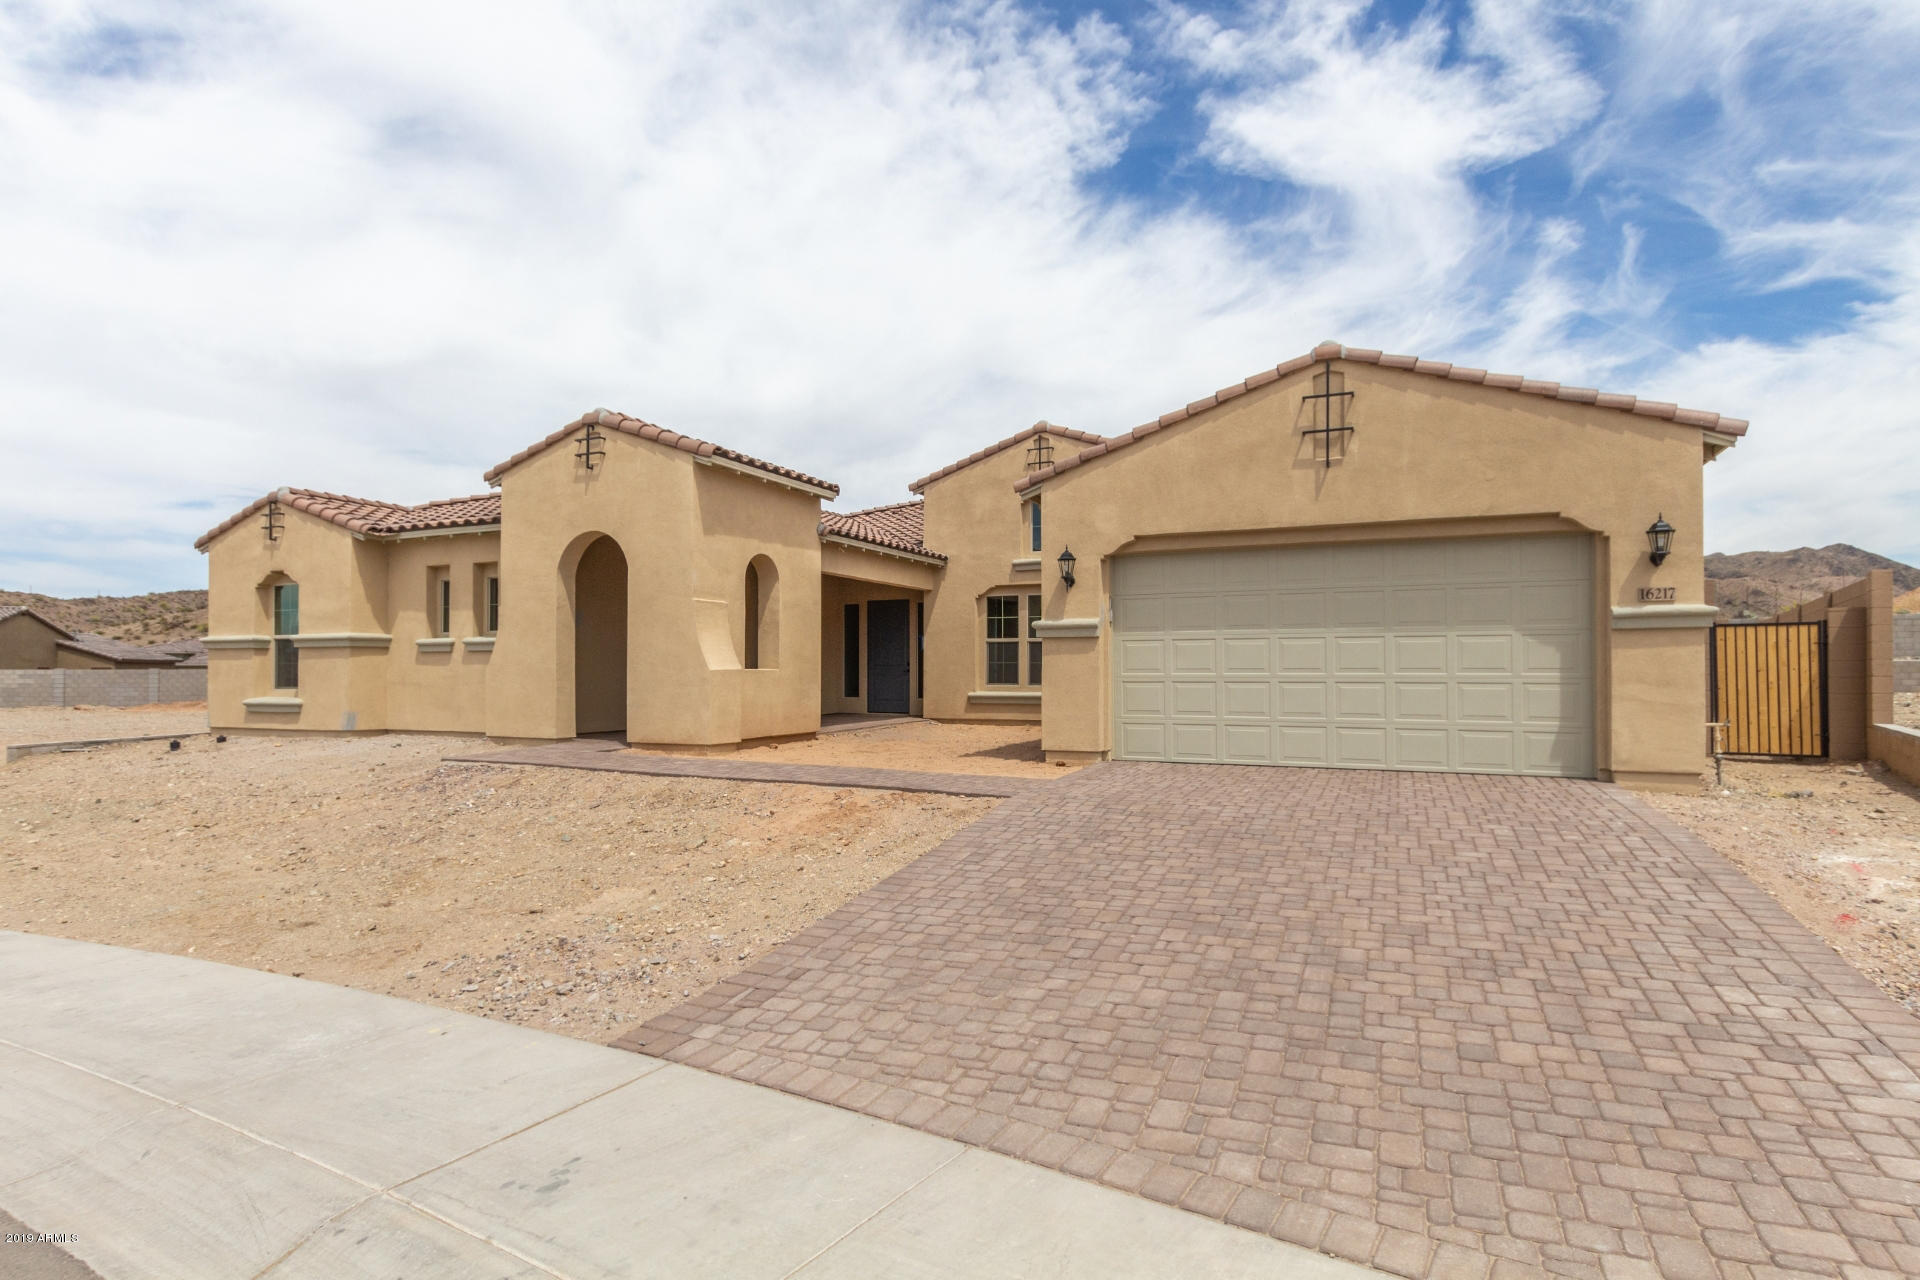 Photo of 16217 S 35th Drive, Phoenix, AZ 85045